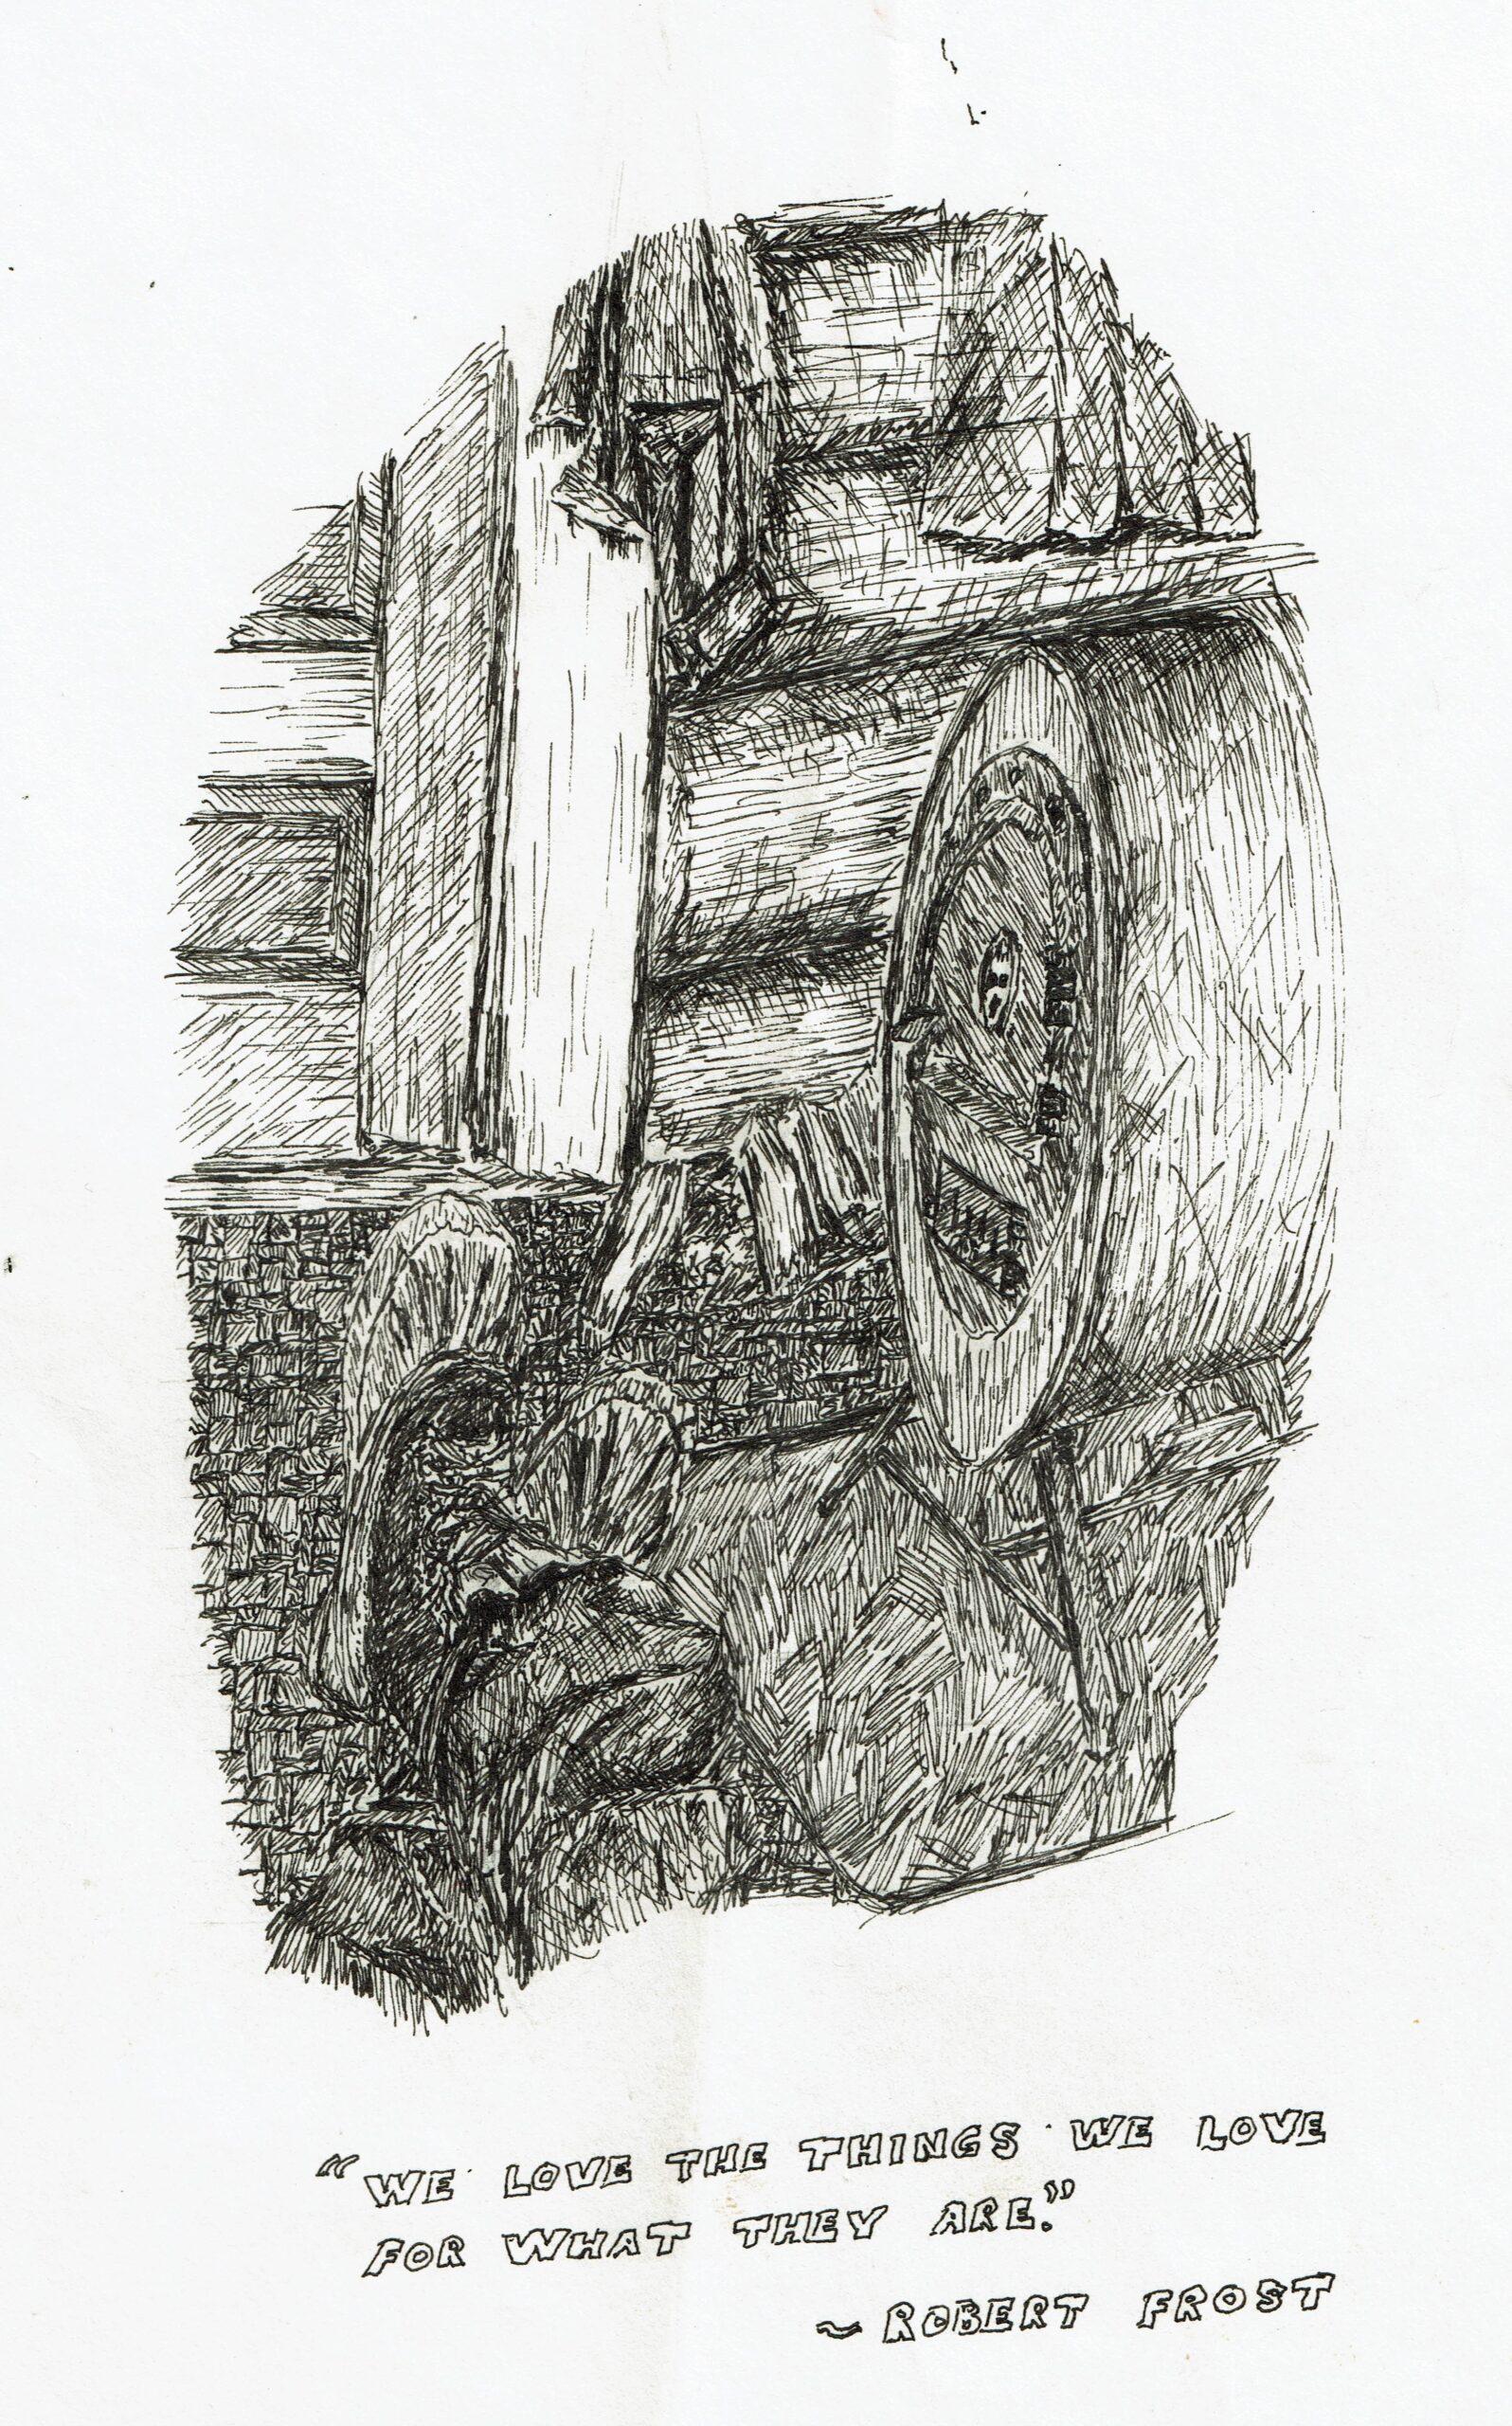 Buyck log cabin, ink drawing, barrelstove